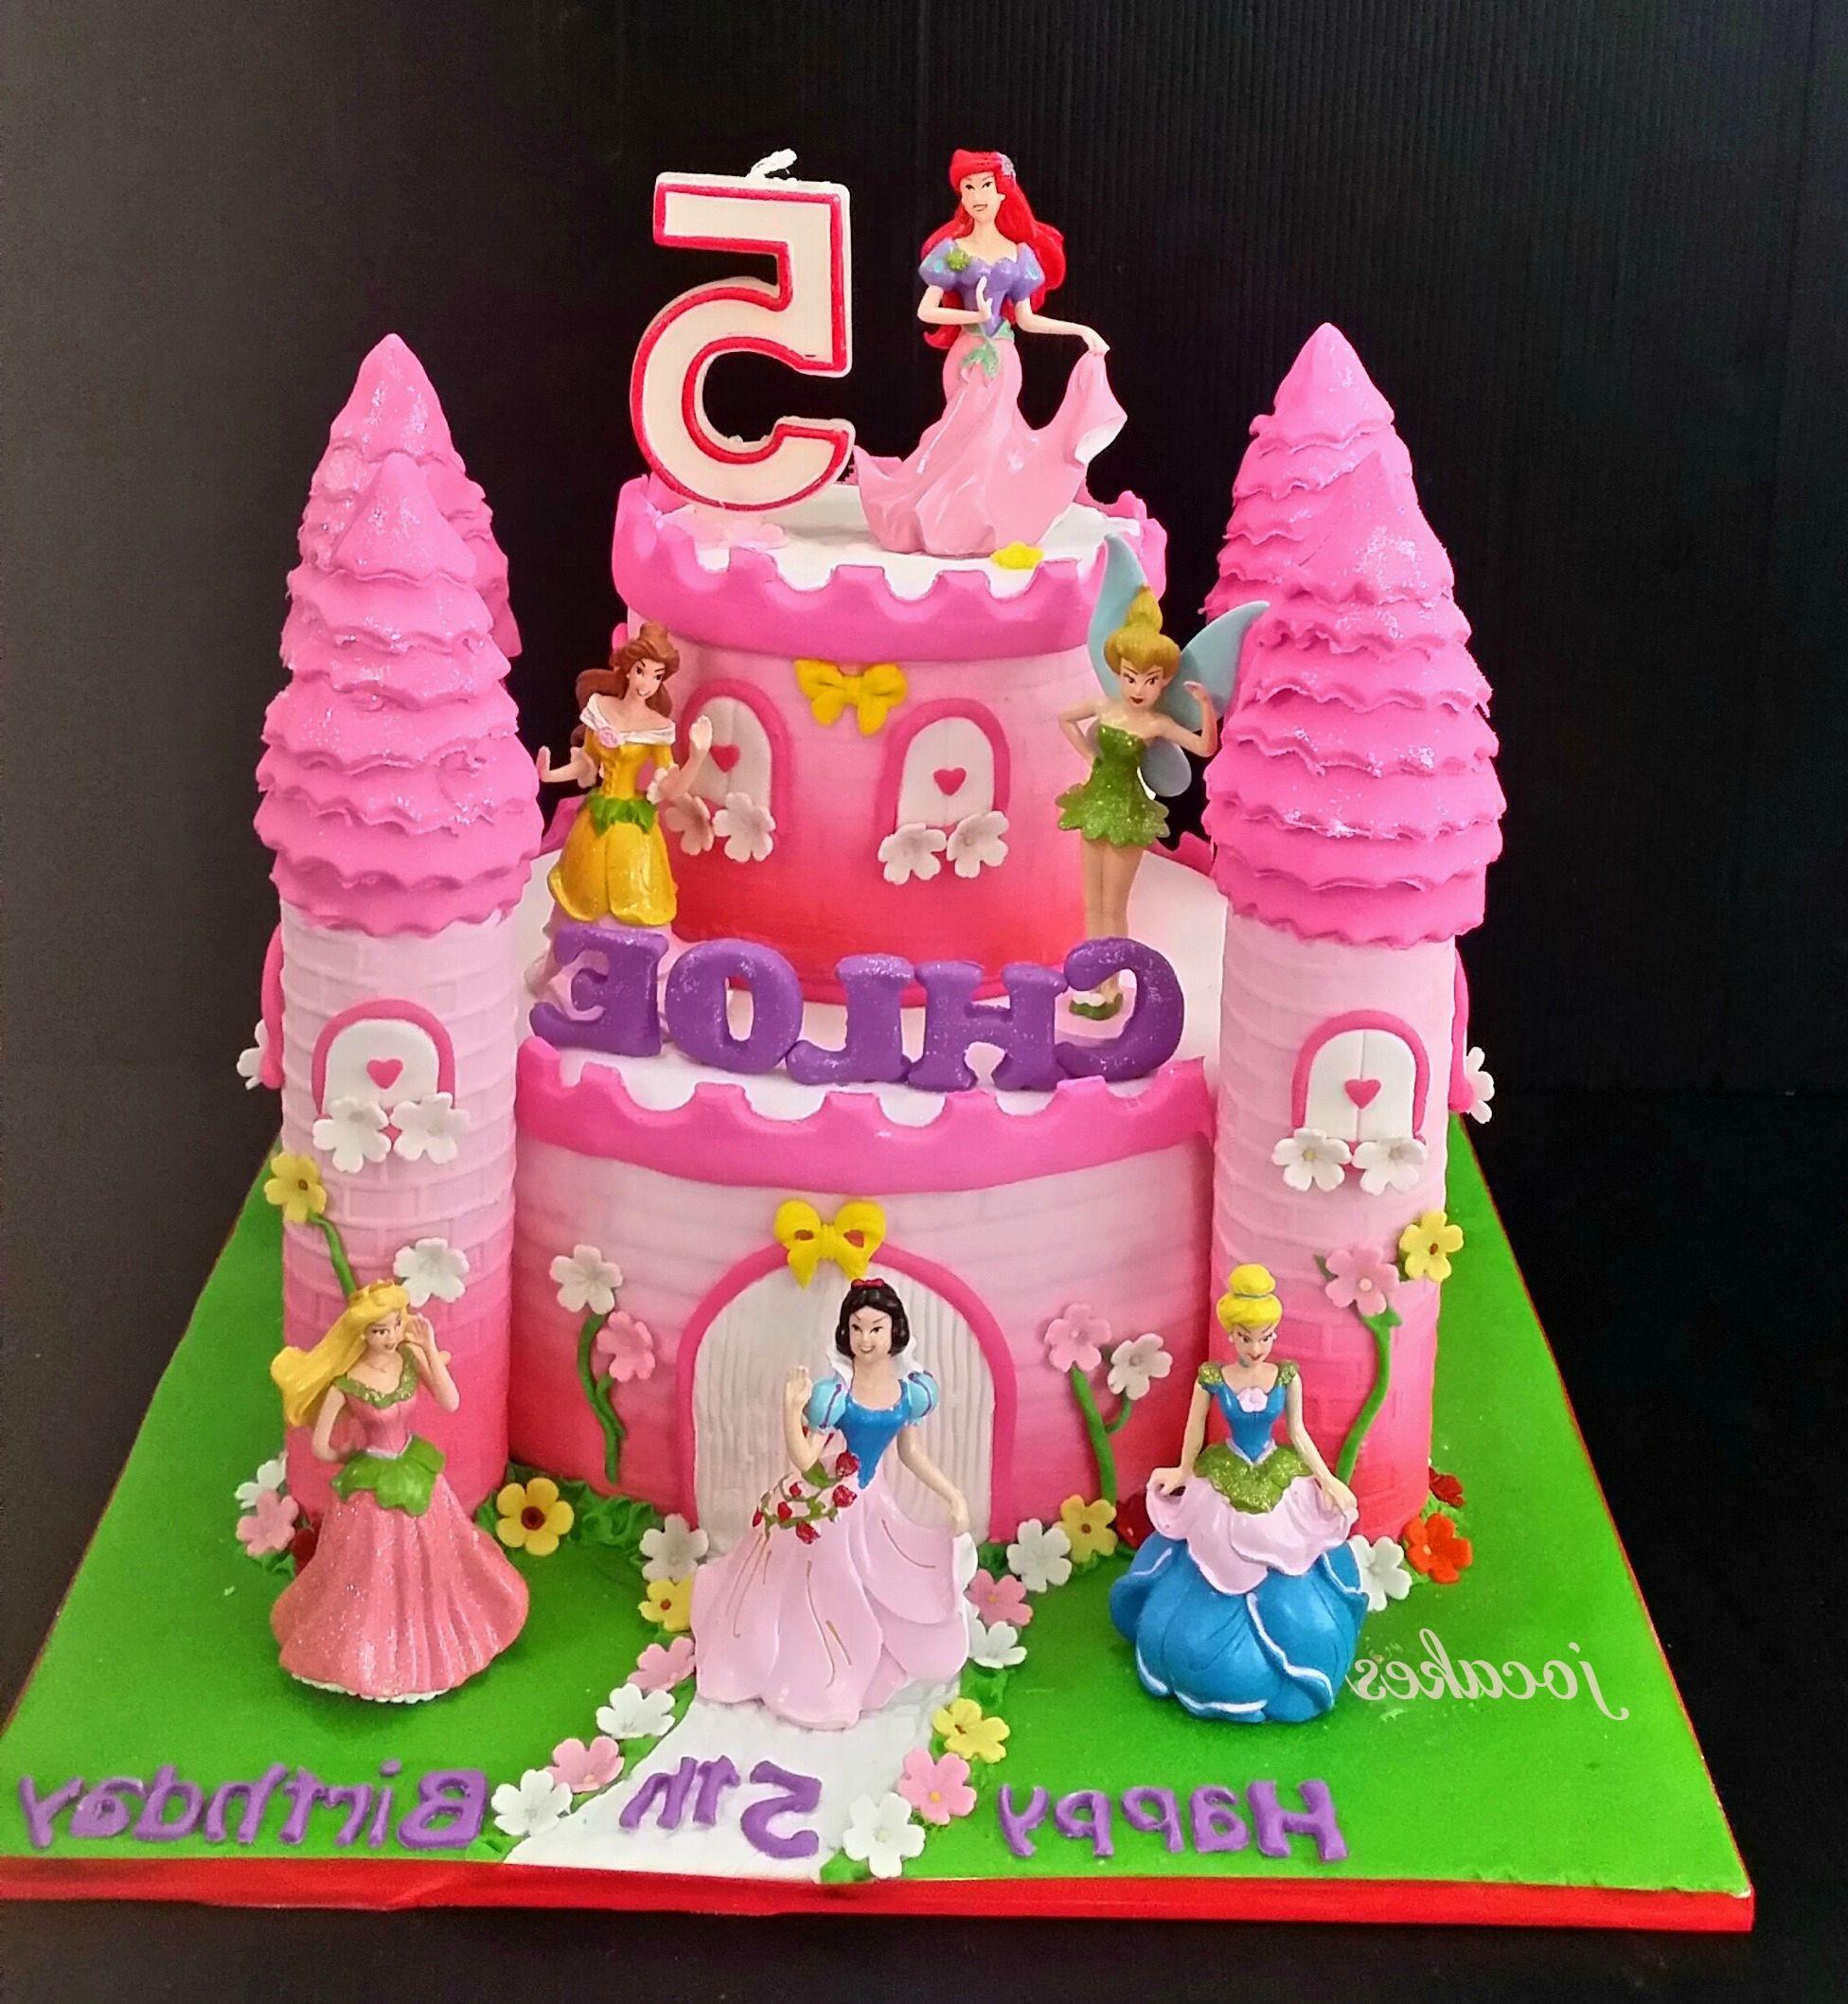 Terrific 12 5Th Birthday Cakes For Girls Photo Girls 5Th Birthday Cake Funny Birthday Cards Online Bapapcheapnameinfo